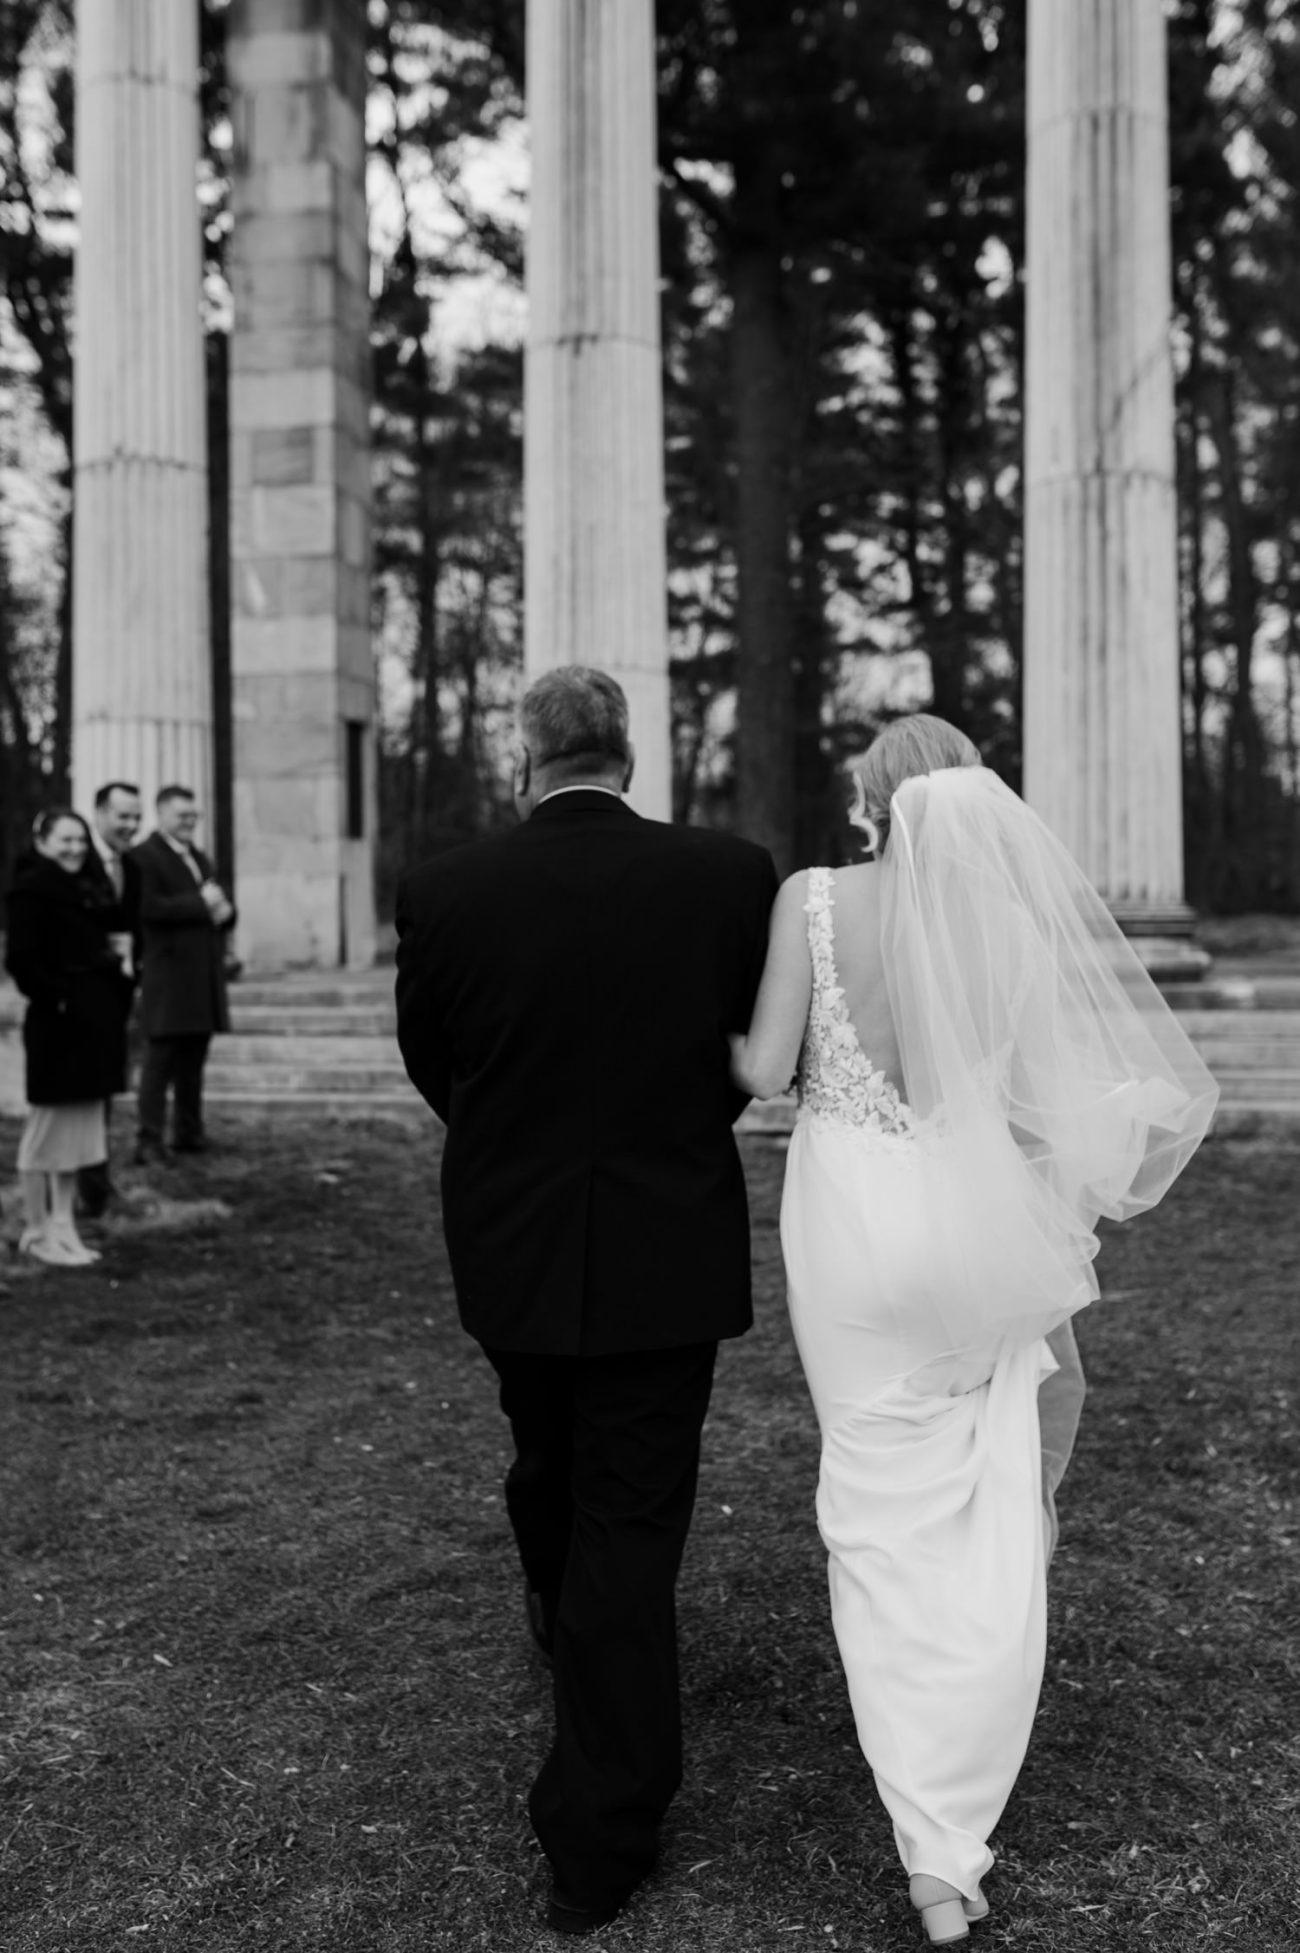 Princeton Battlefield Wedding Princeton University Elopement New Jersey Wedding Photographer Anais Possamai Photography 05